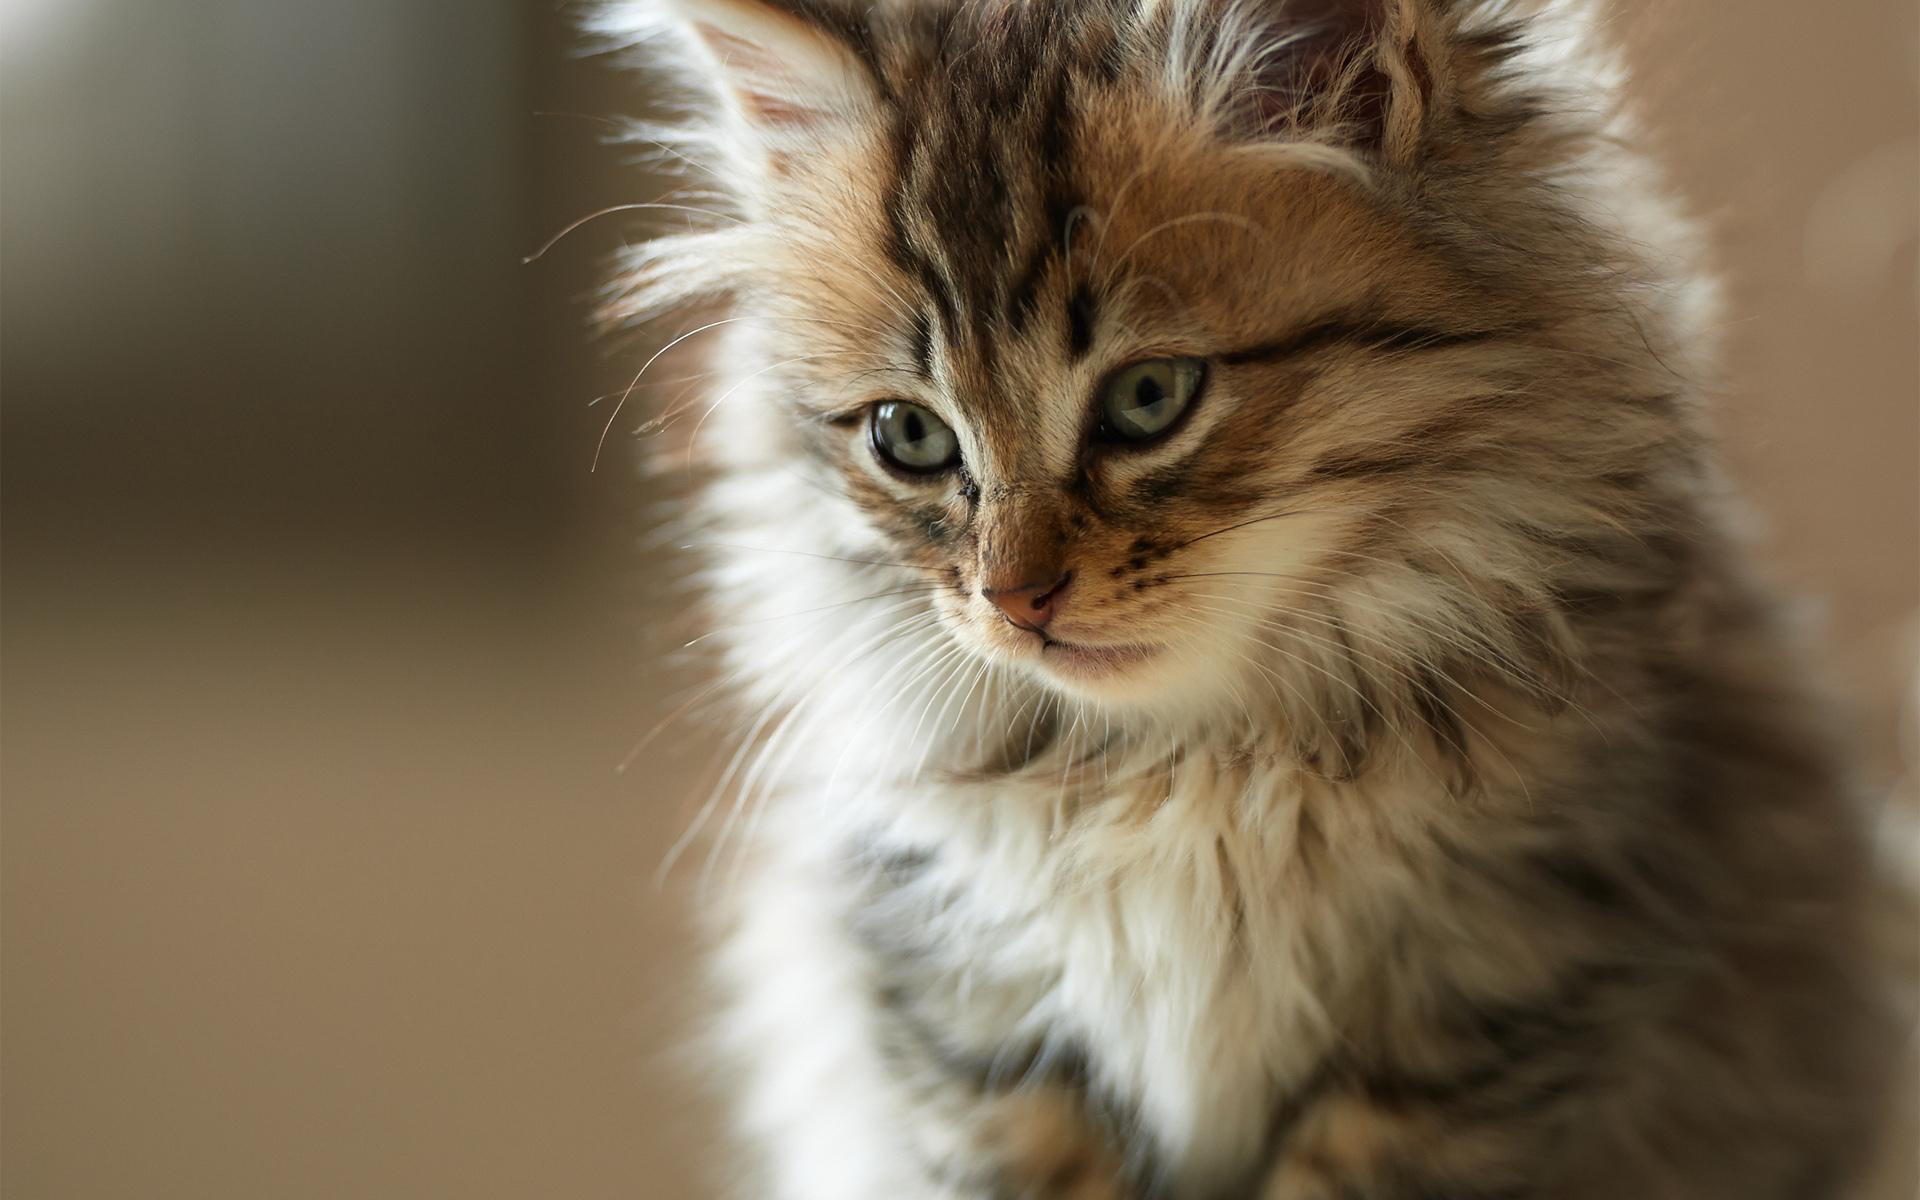 Fluffy Kitty Cute Wallpaper 1920x1200 13017